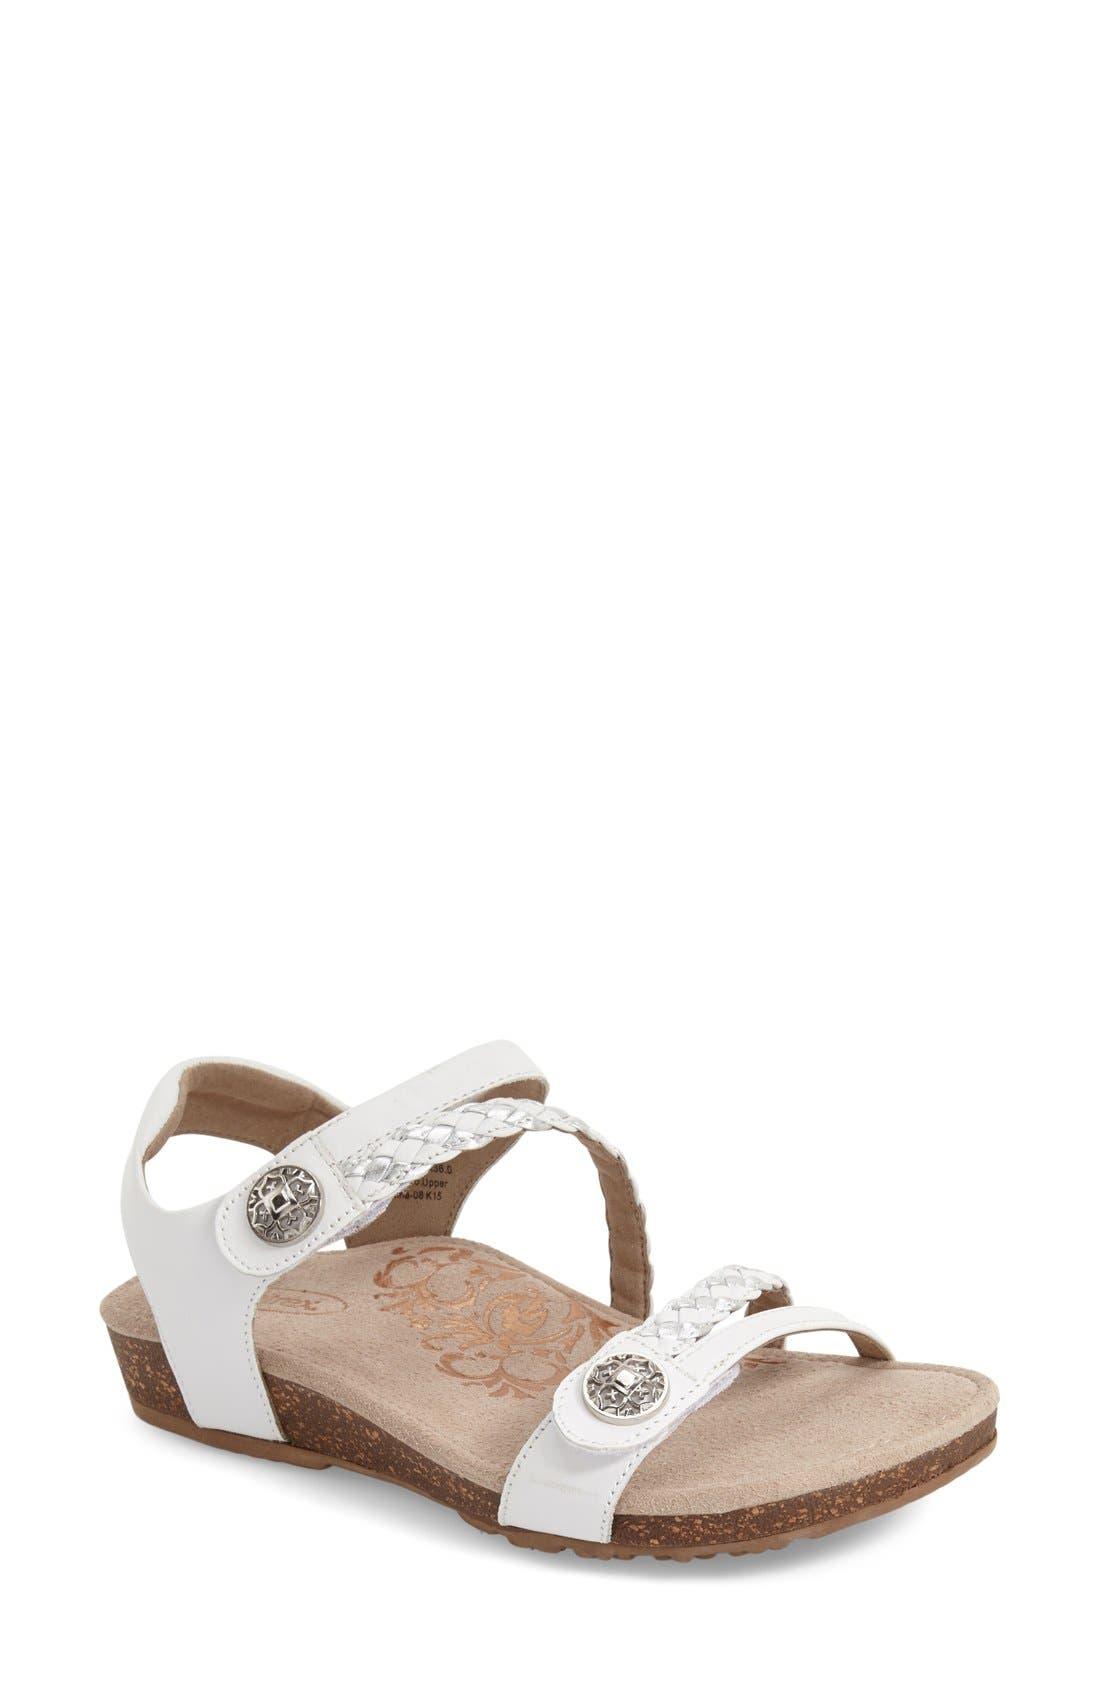 'Jillian' Braided Leather Strap Sandal